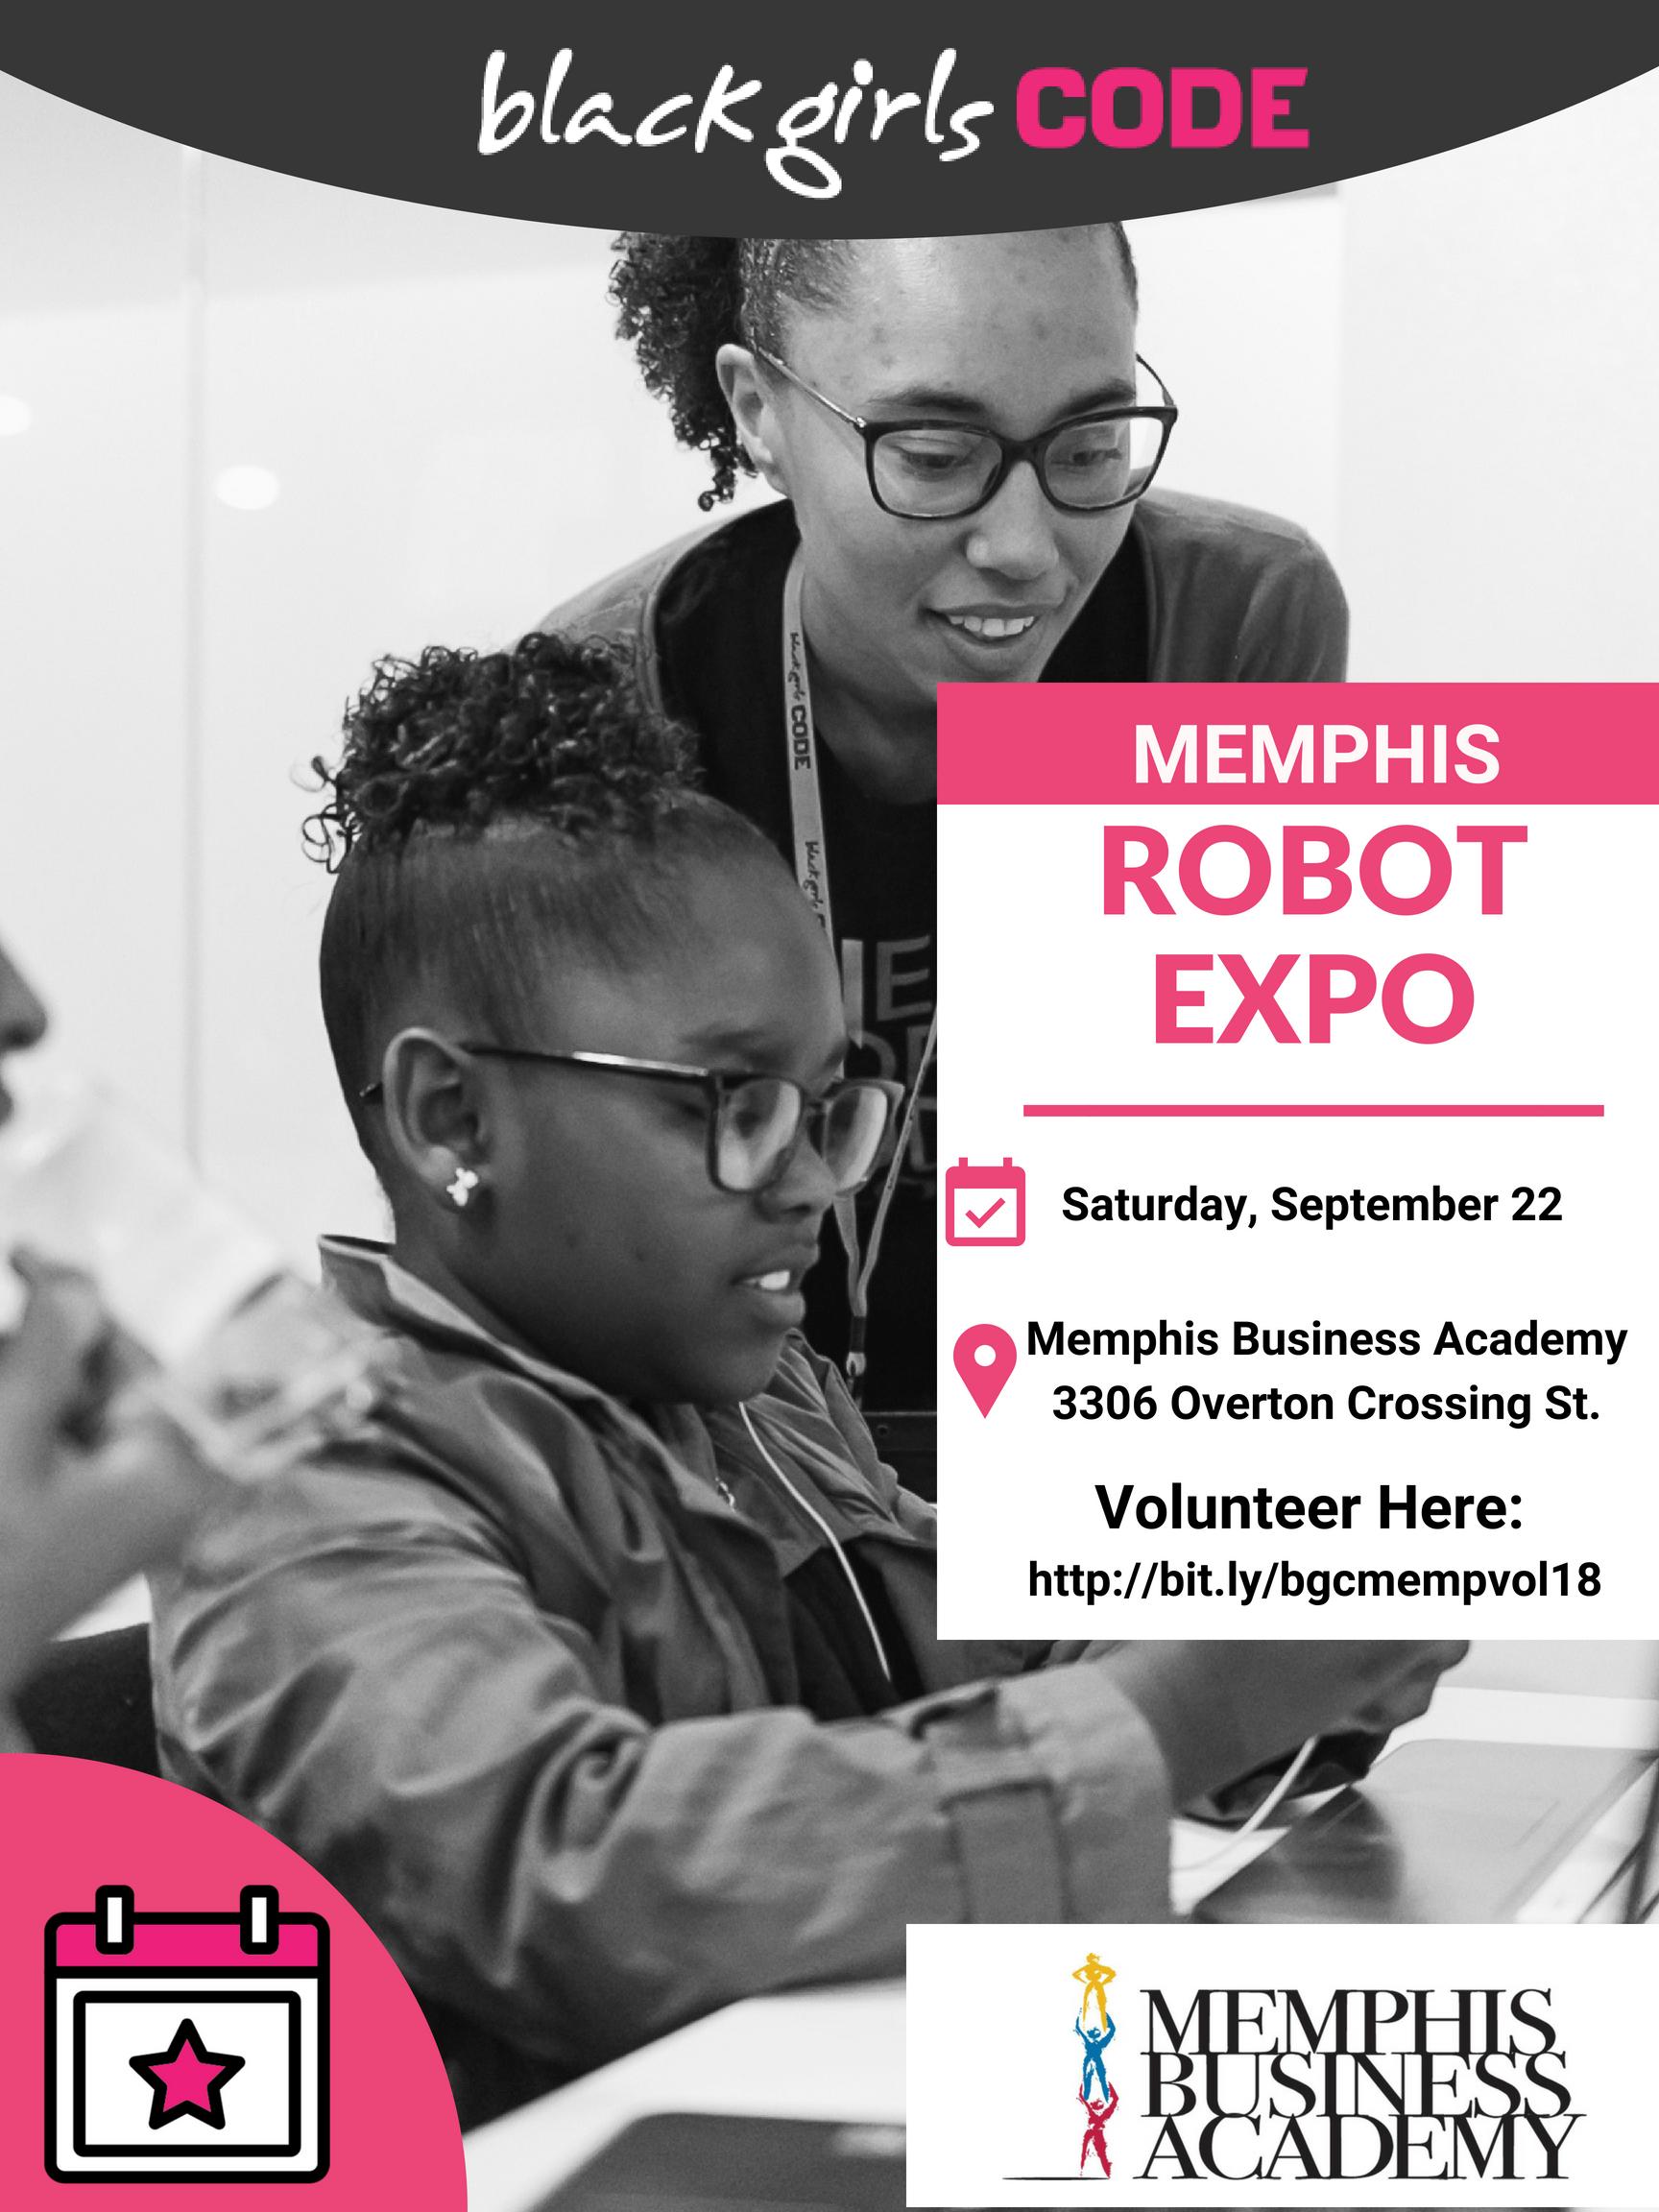 Memphis Robot Expo Experience - Volunteer.png